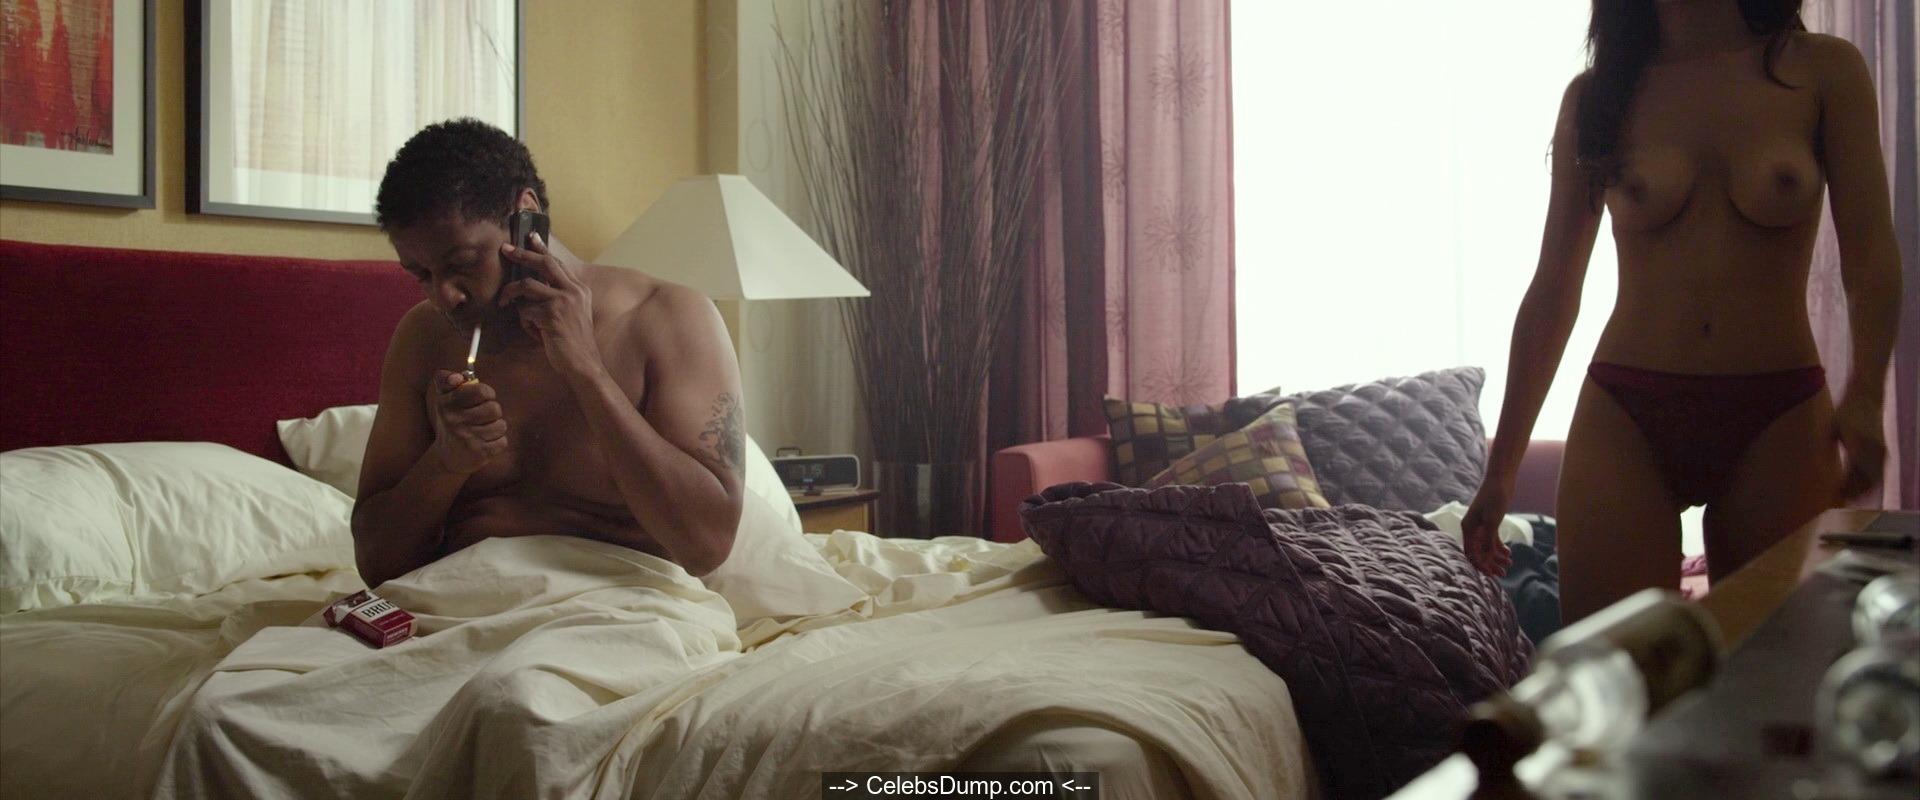 Nadine velazquez nudes snapchat sex tape